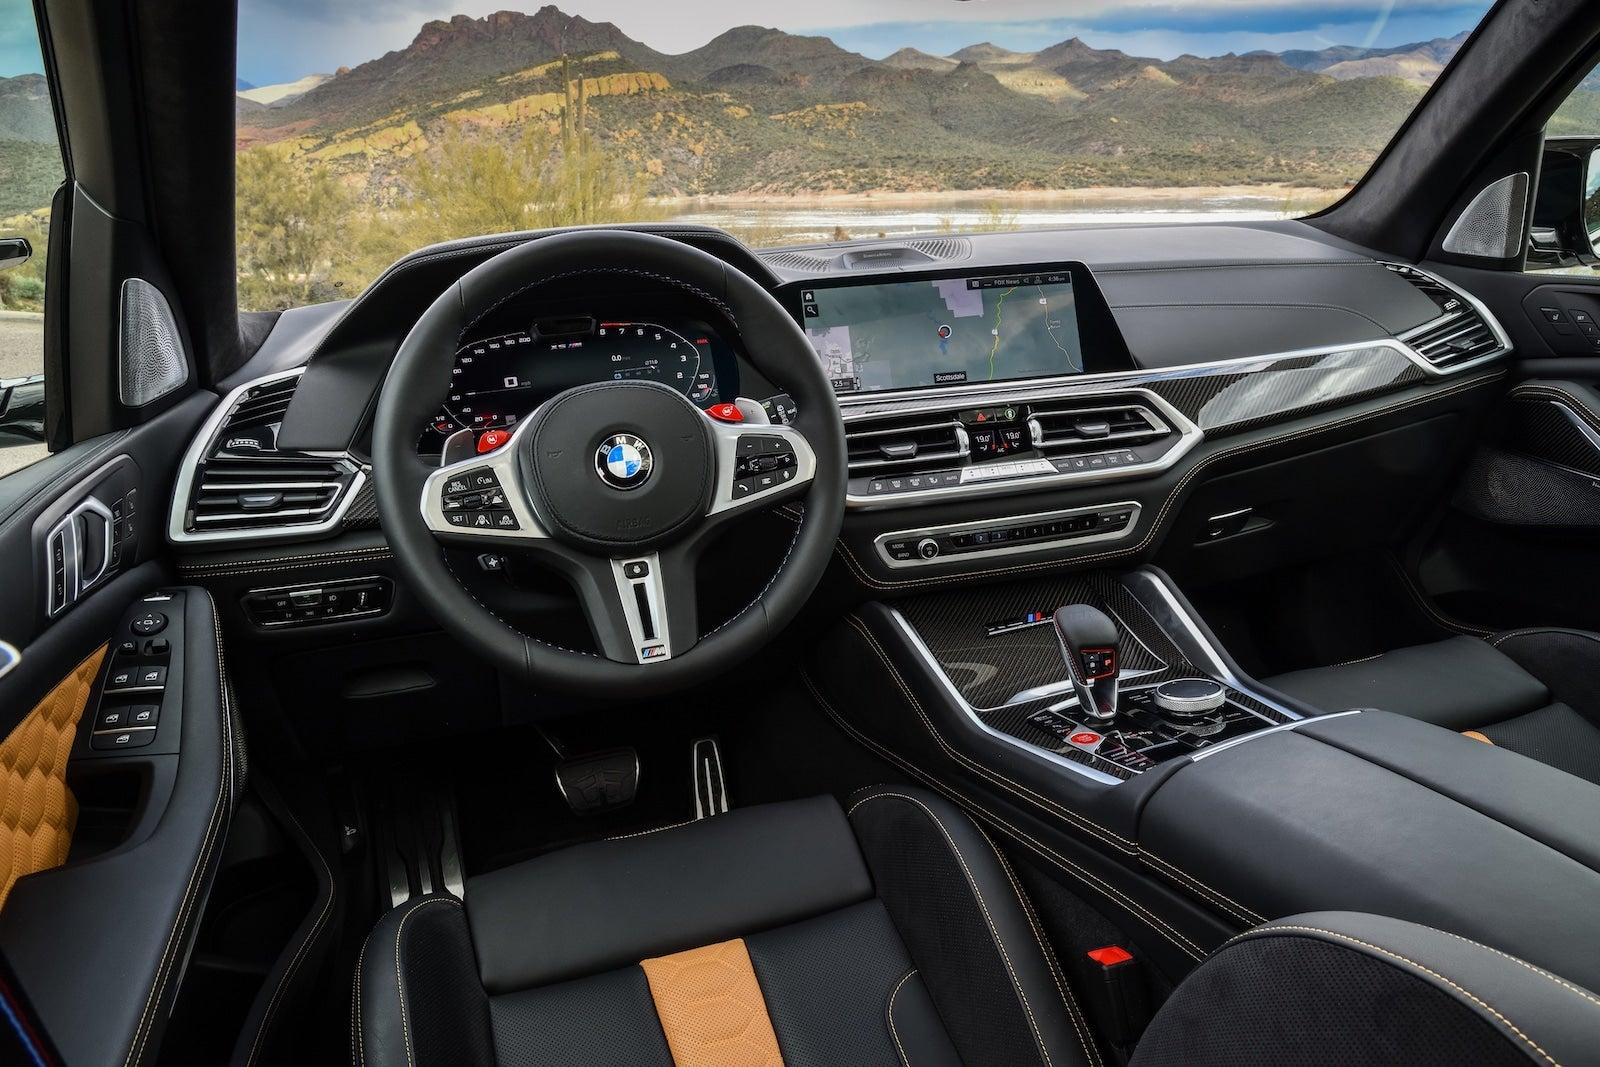 First Drive: 2020 BMW X5 M50i  TheDetroitBureau.com